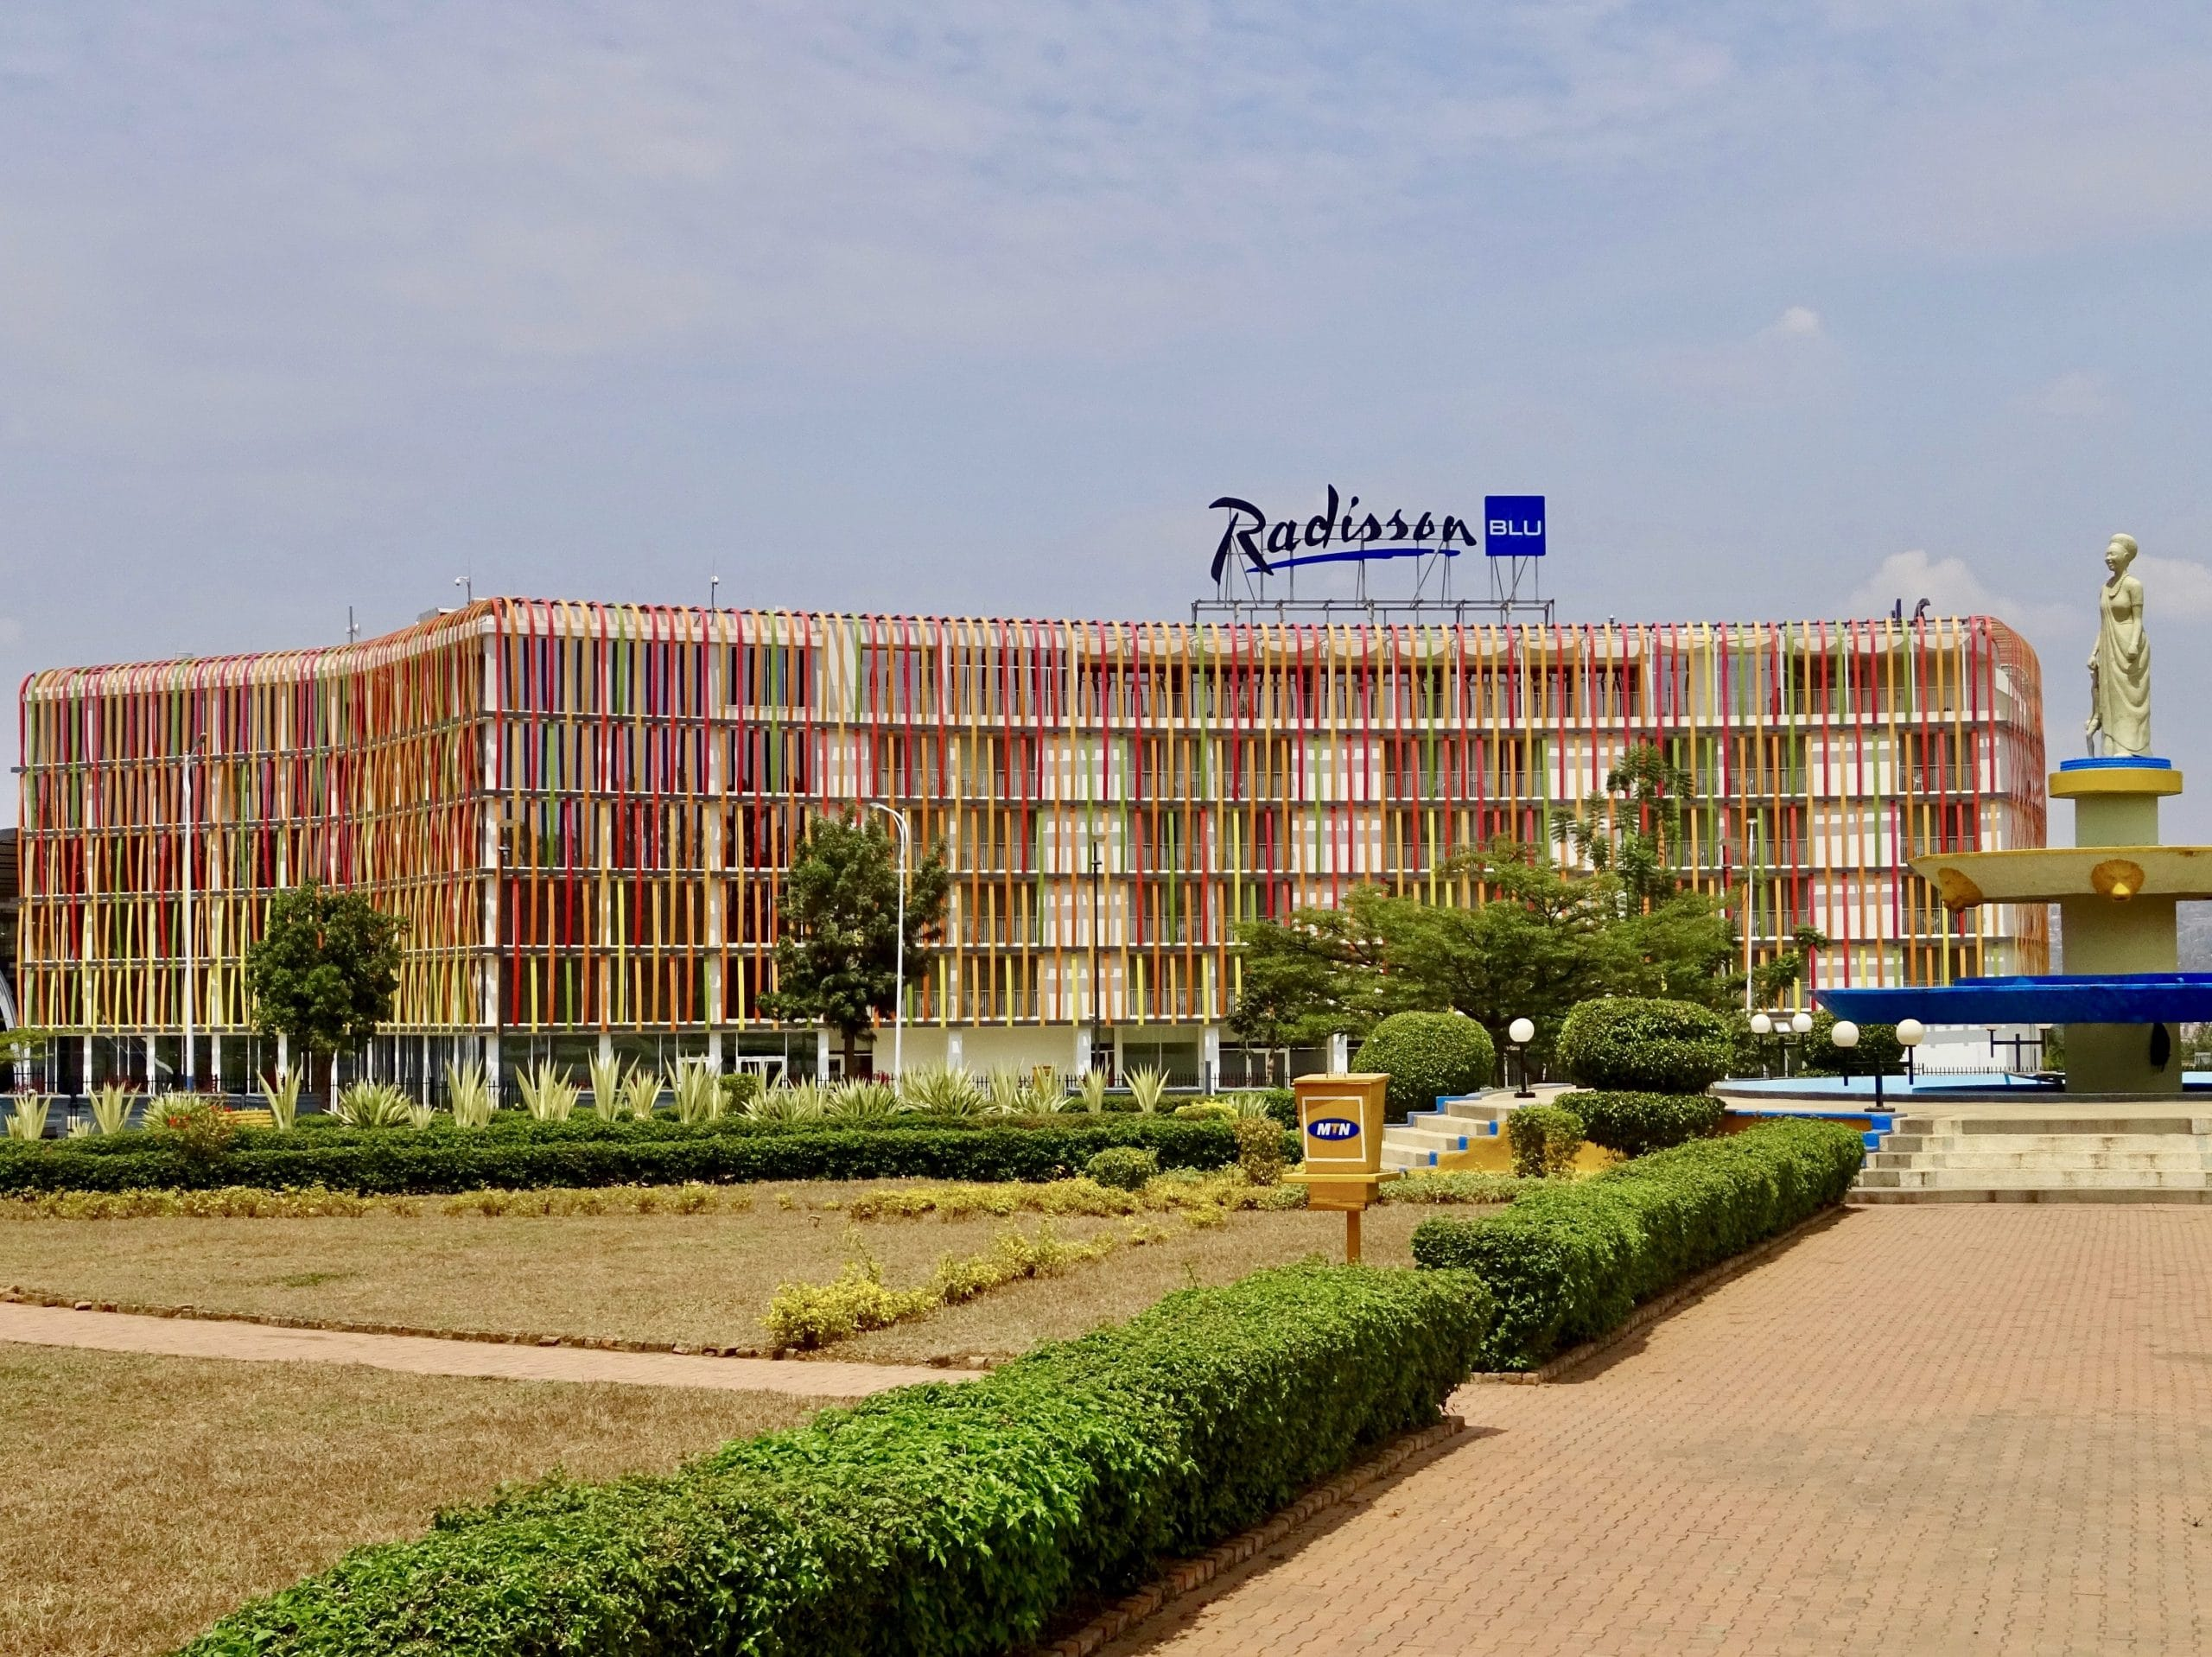 Radisson Hotel in Kigali